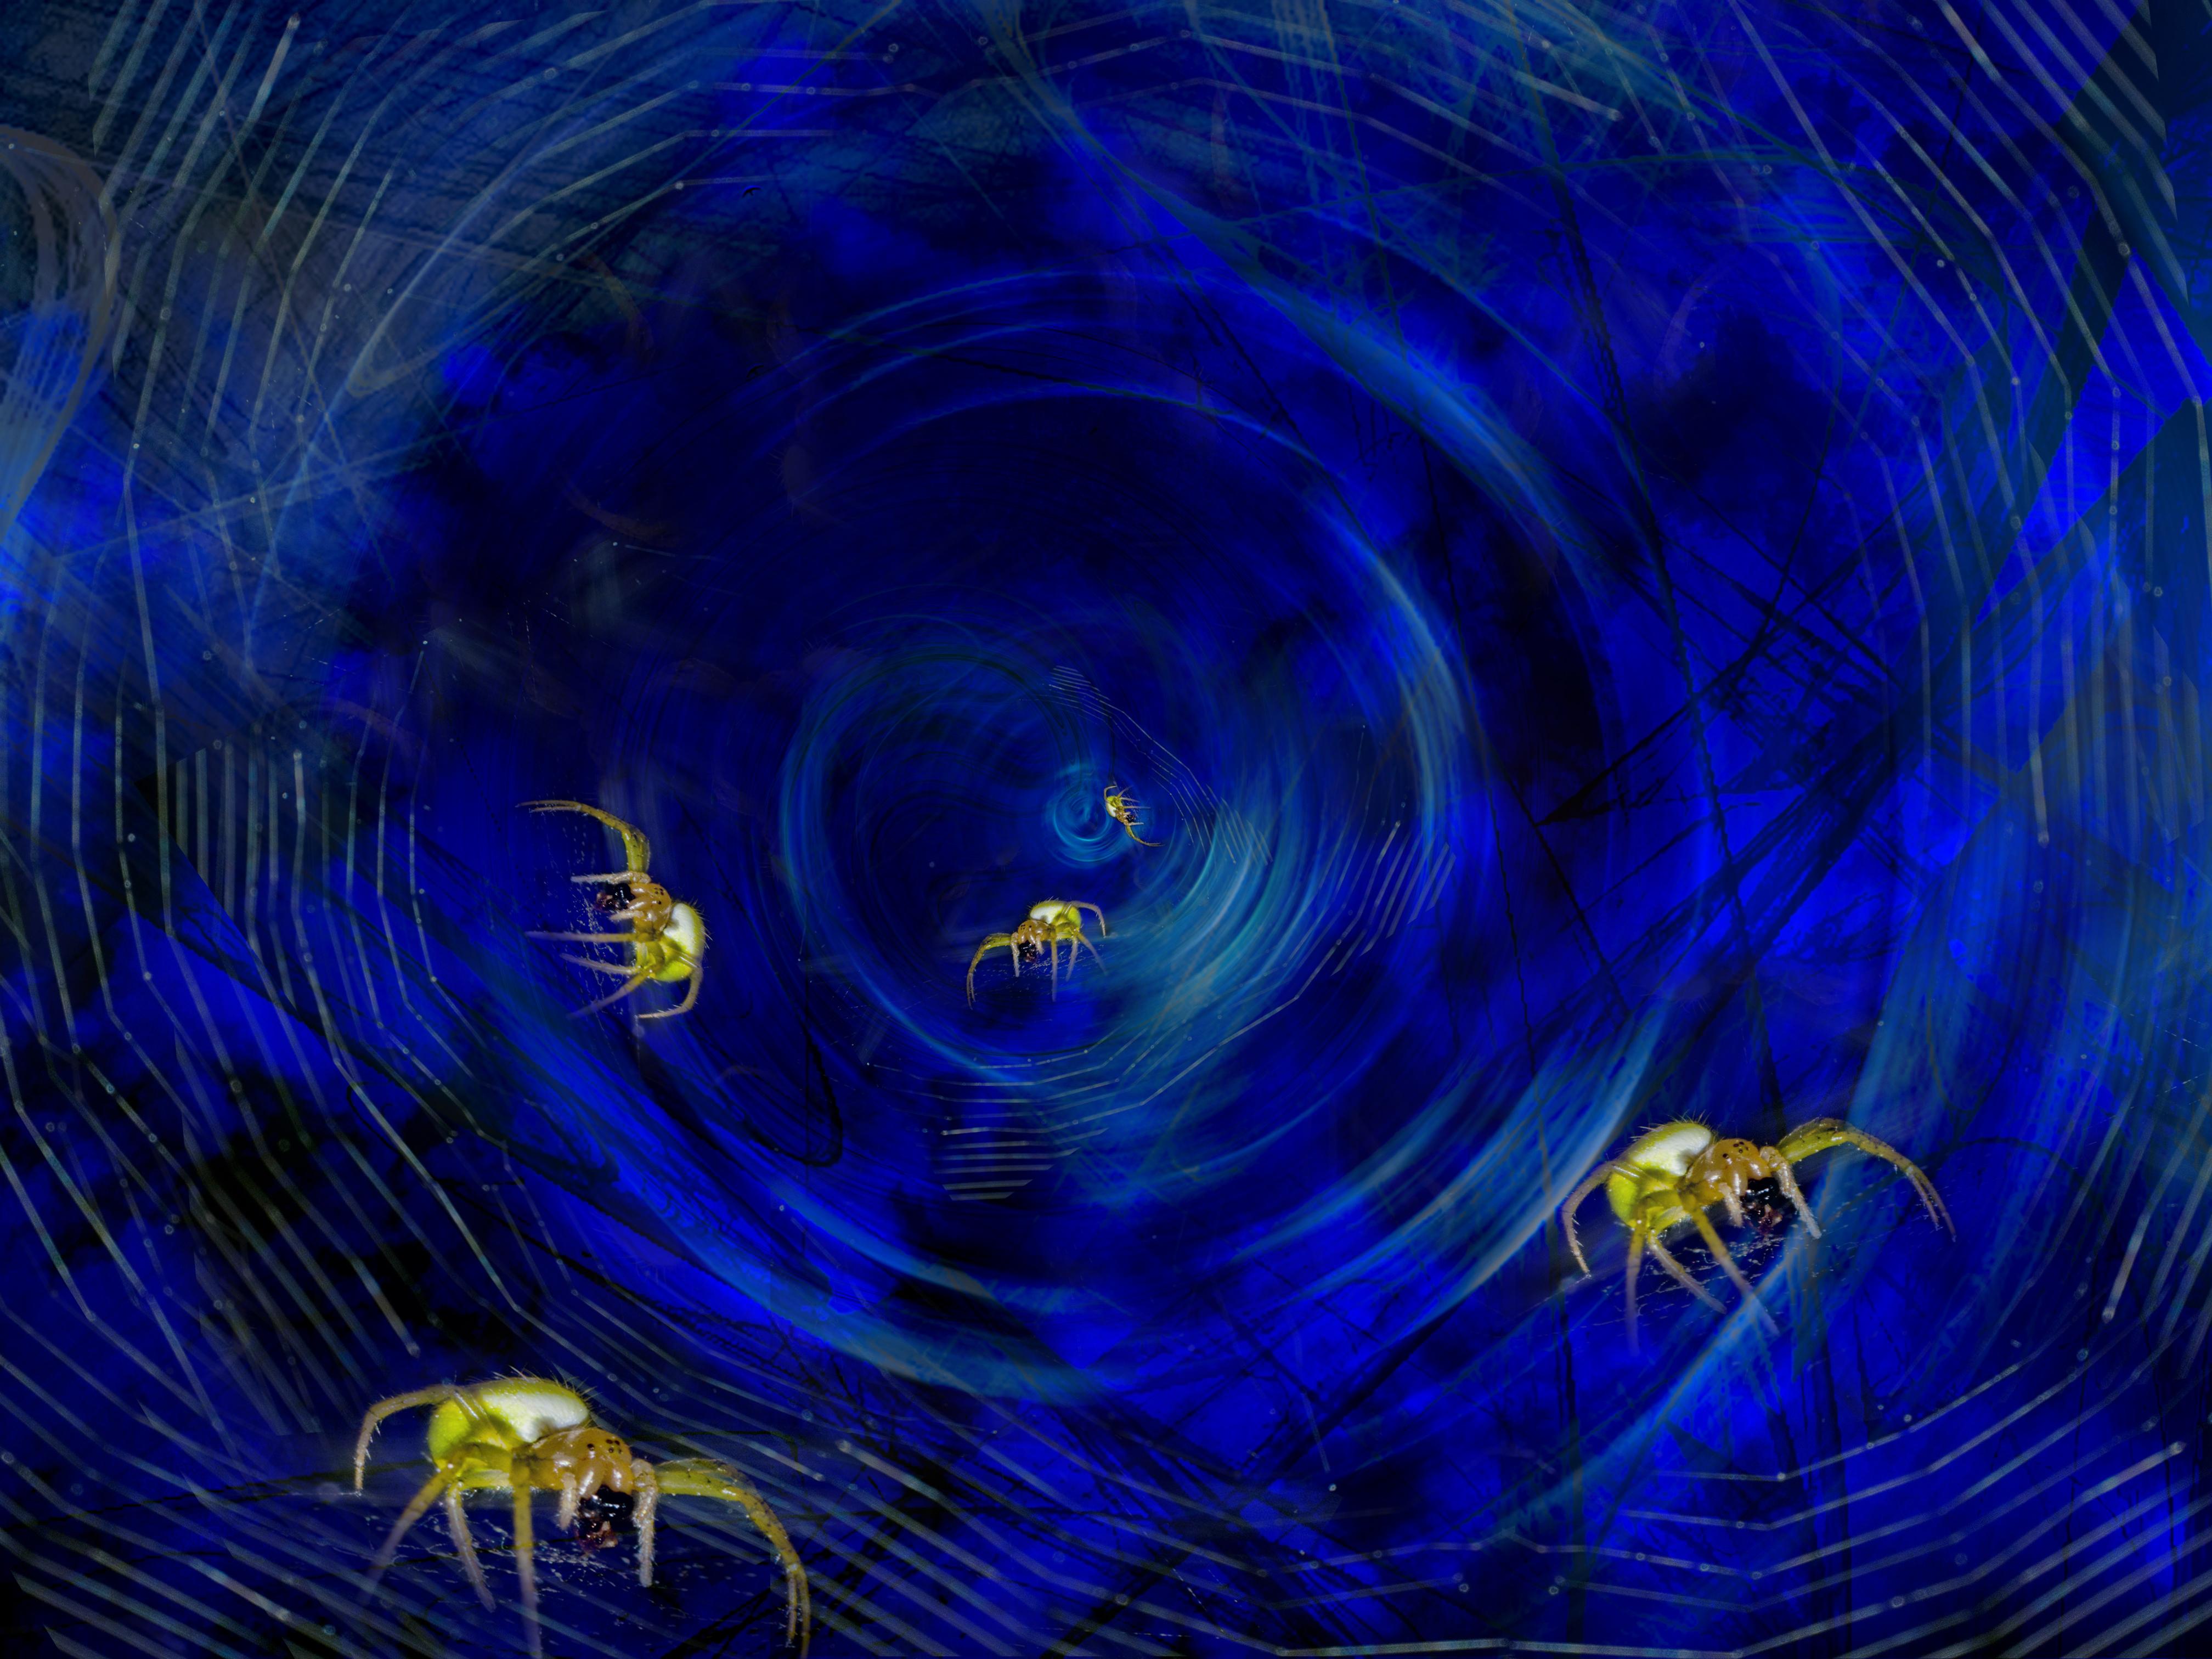 Aracnomania in Blue by bulgphoto